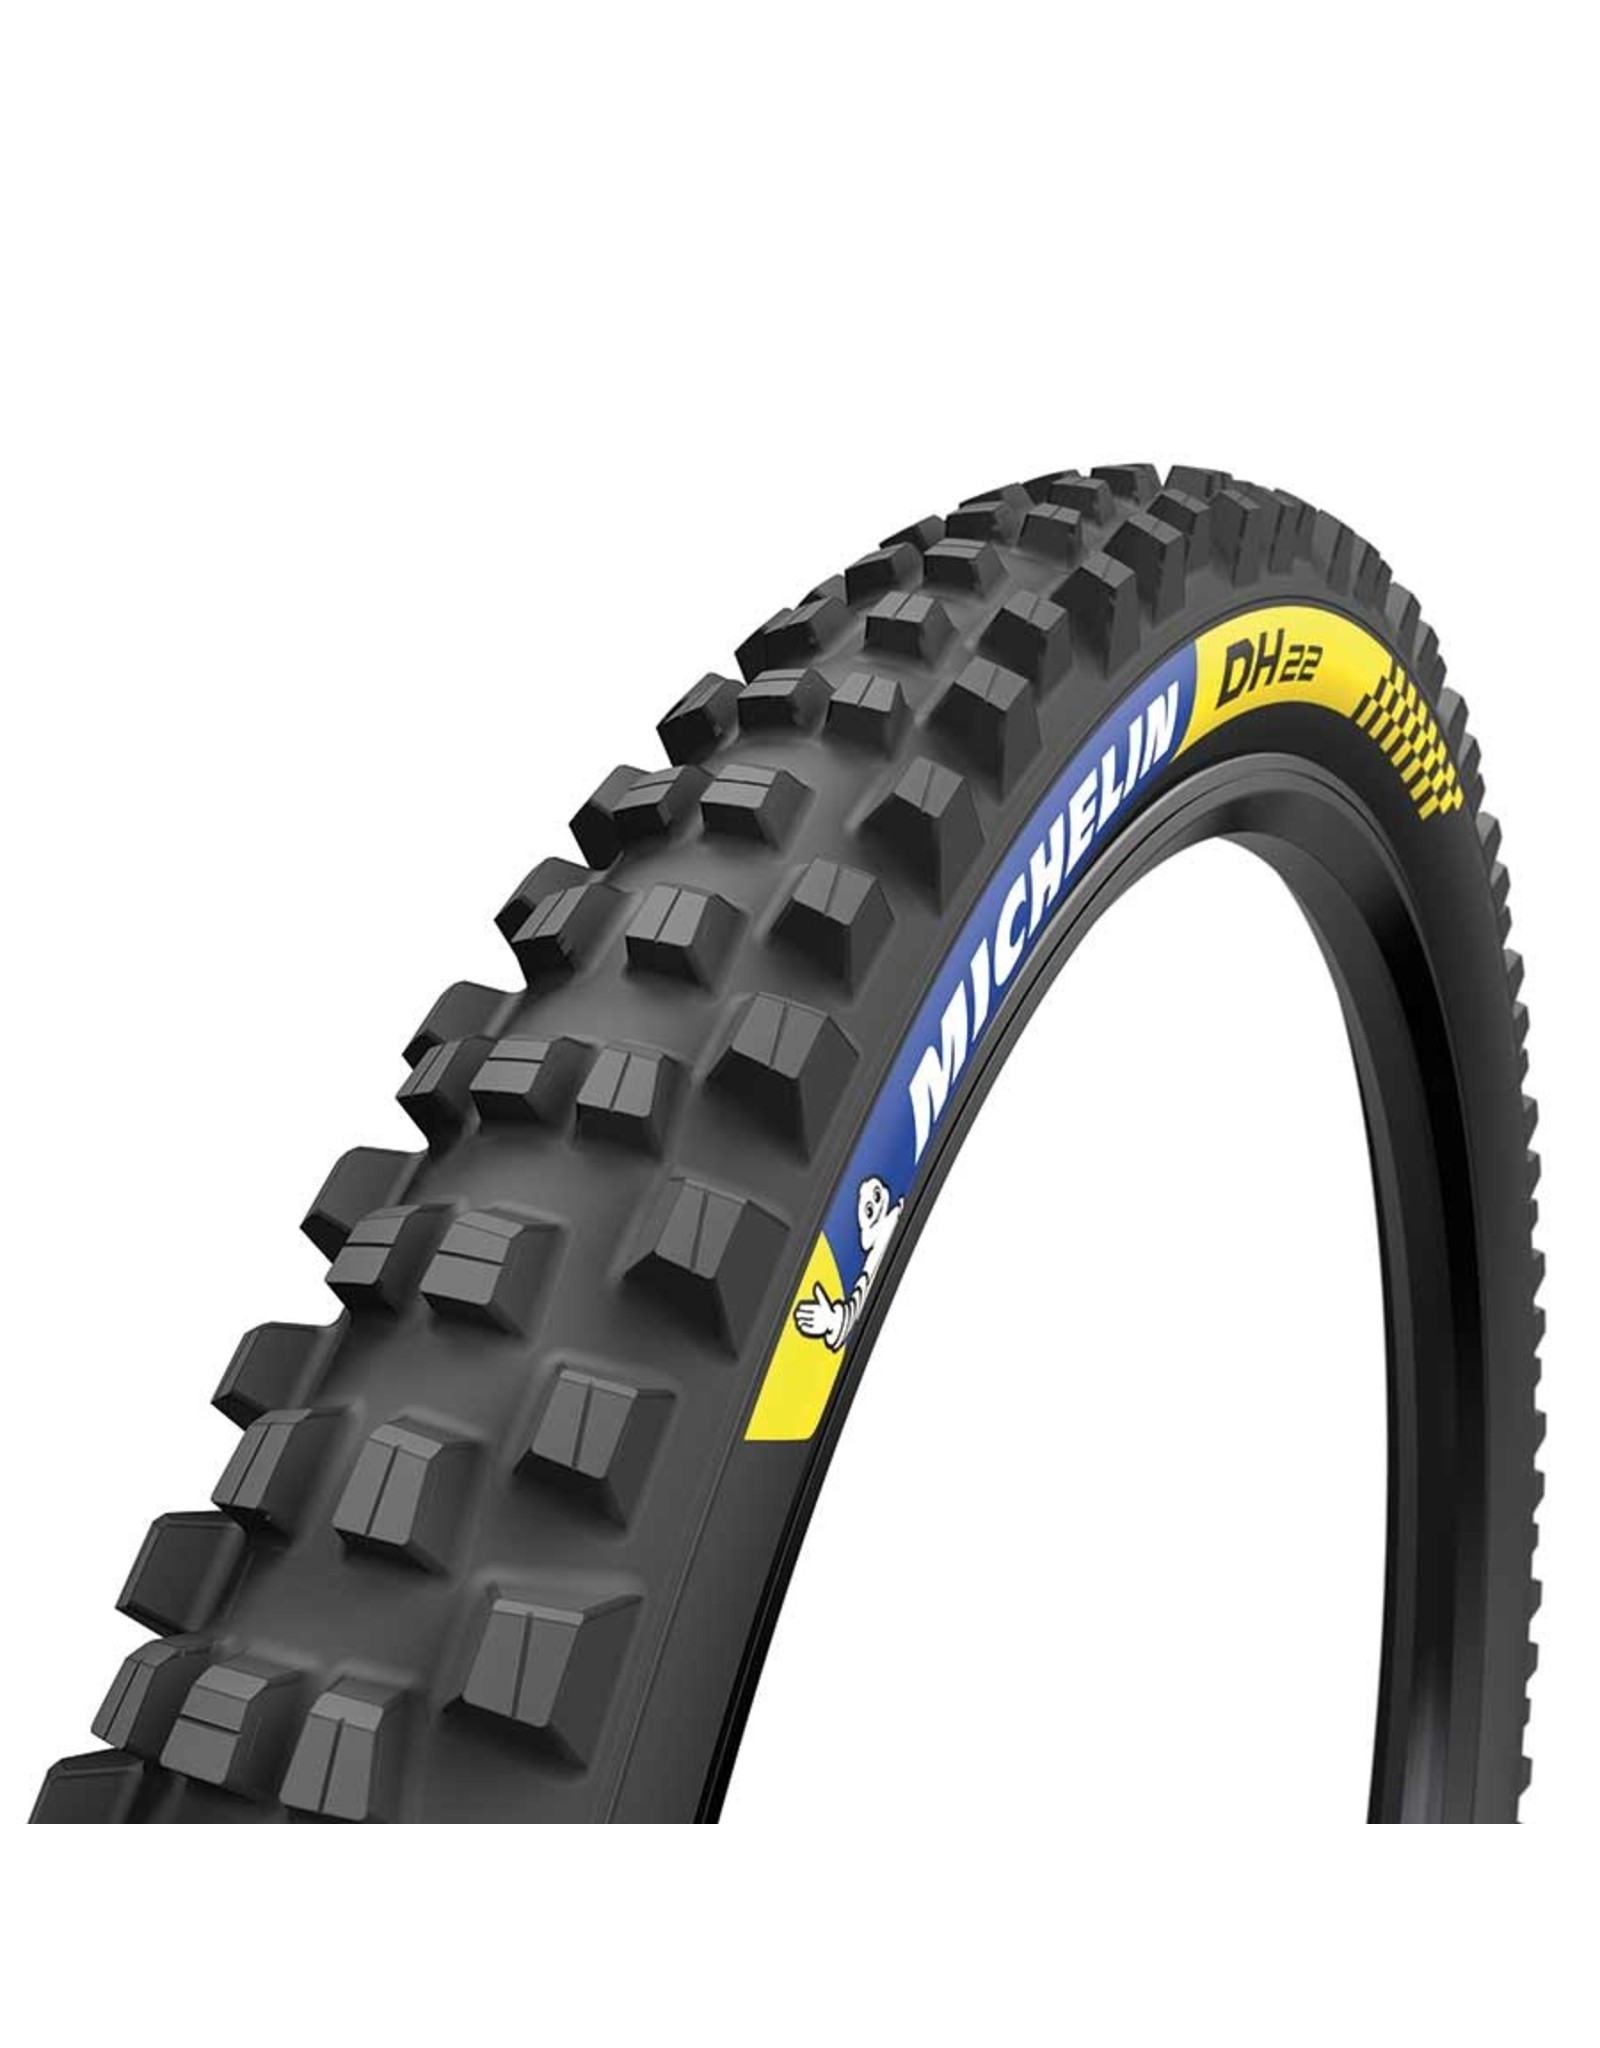 Michelin DH22, Tire, 29''x2.40